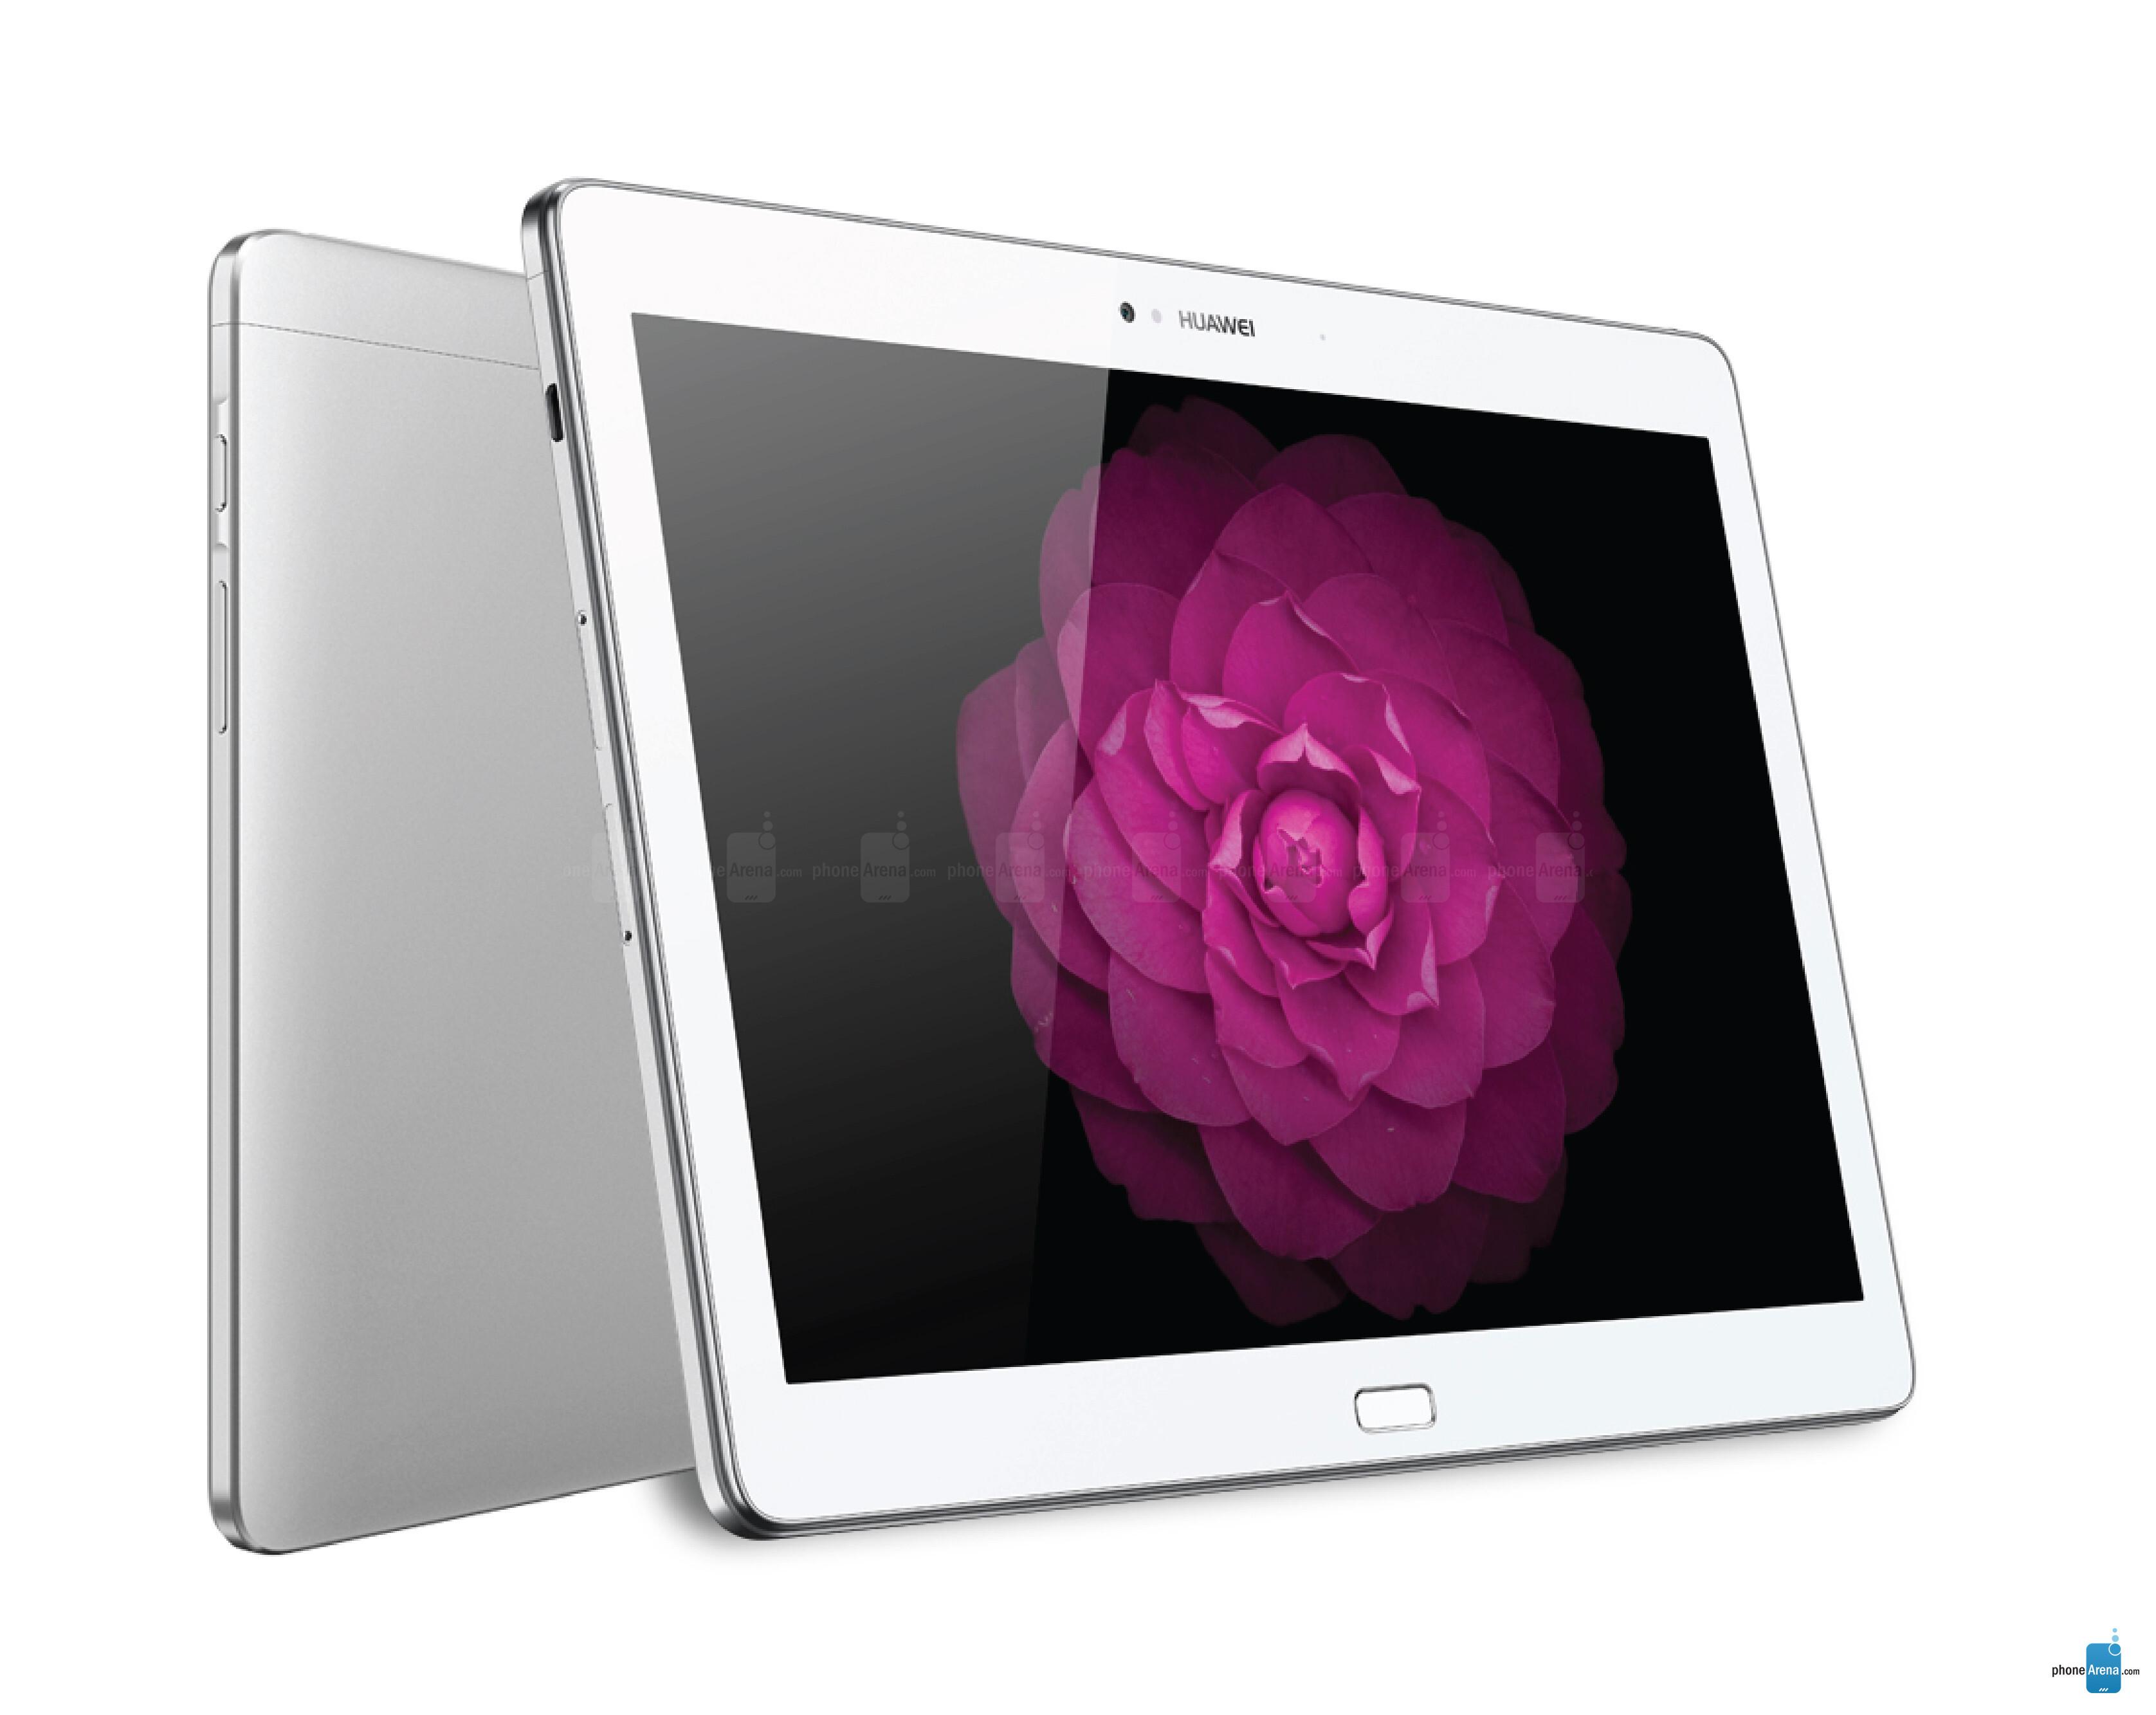 samsung tablet 2 10.1 manual pdf